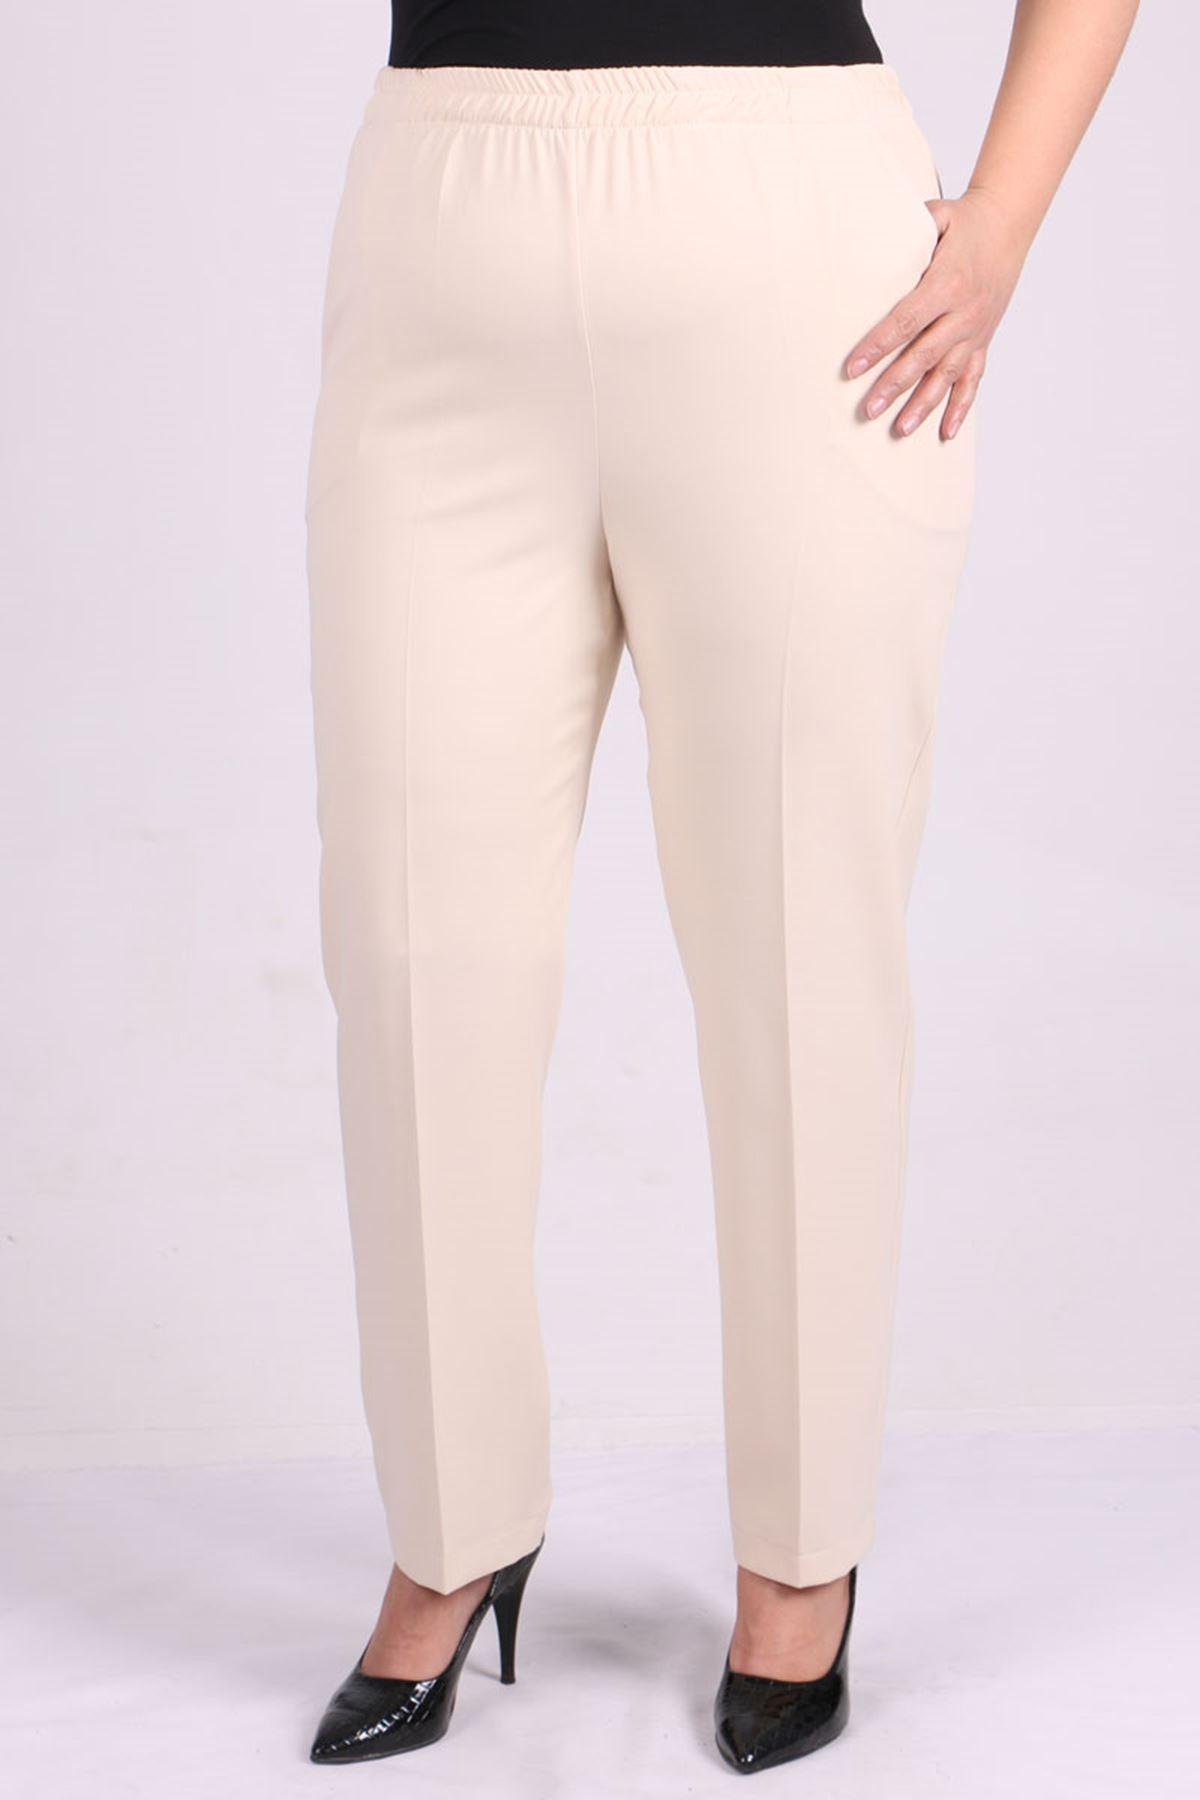 9025 Plus Size Elastic Waist Straight Cut Pants - Stone